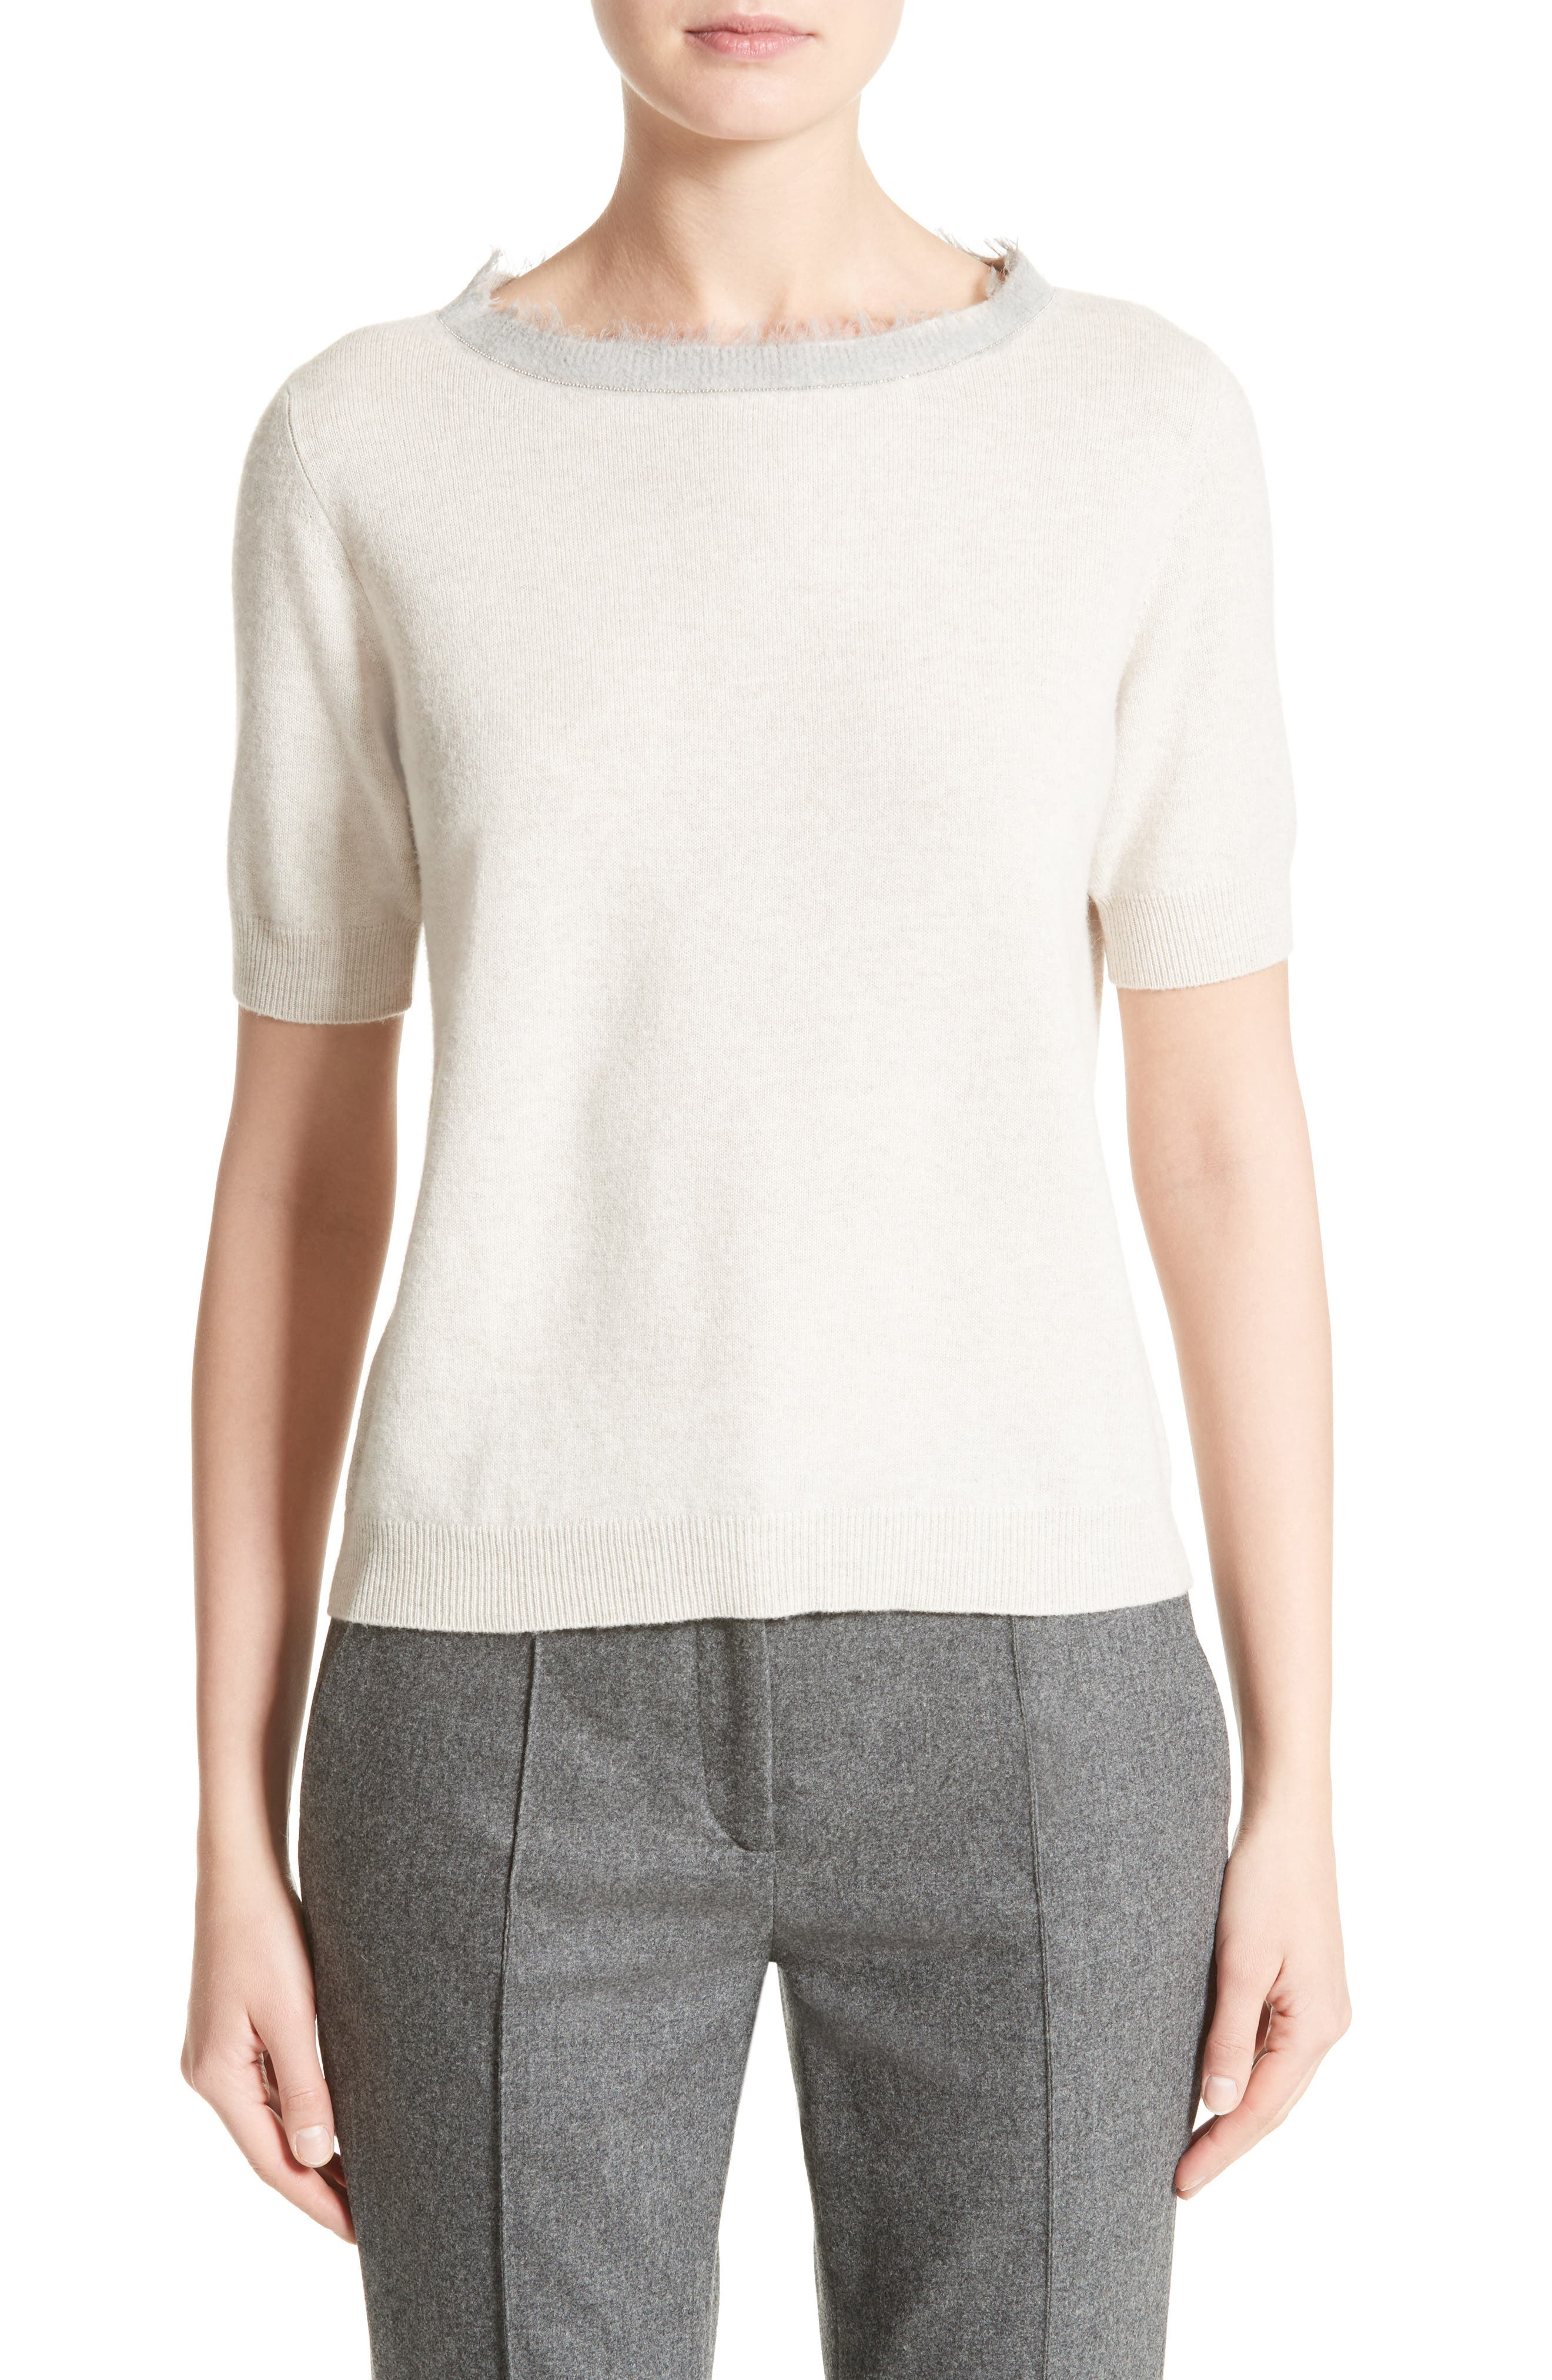 Fabiana Filippi Wool, Silk & Cashmere Sweater